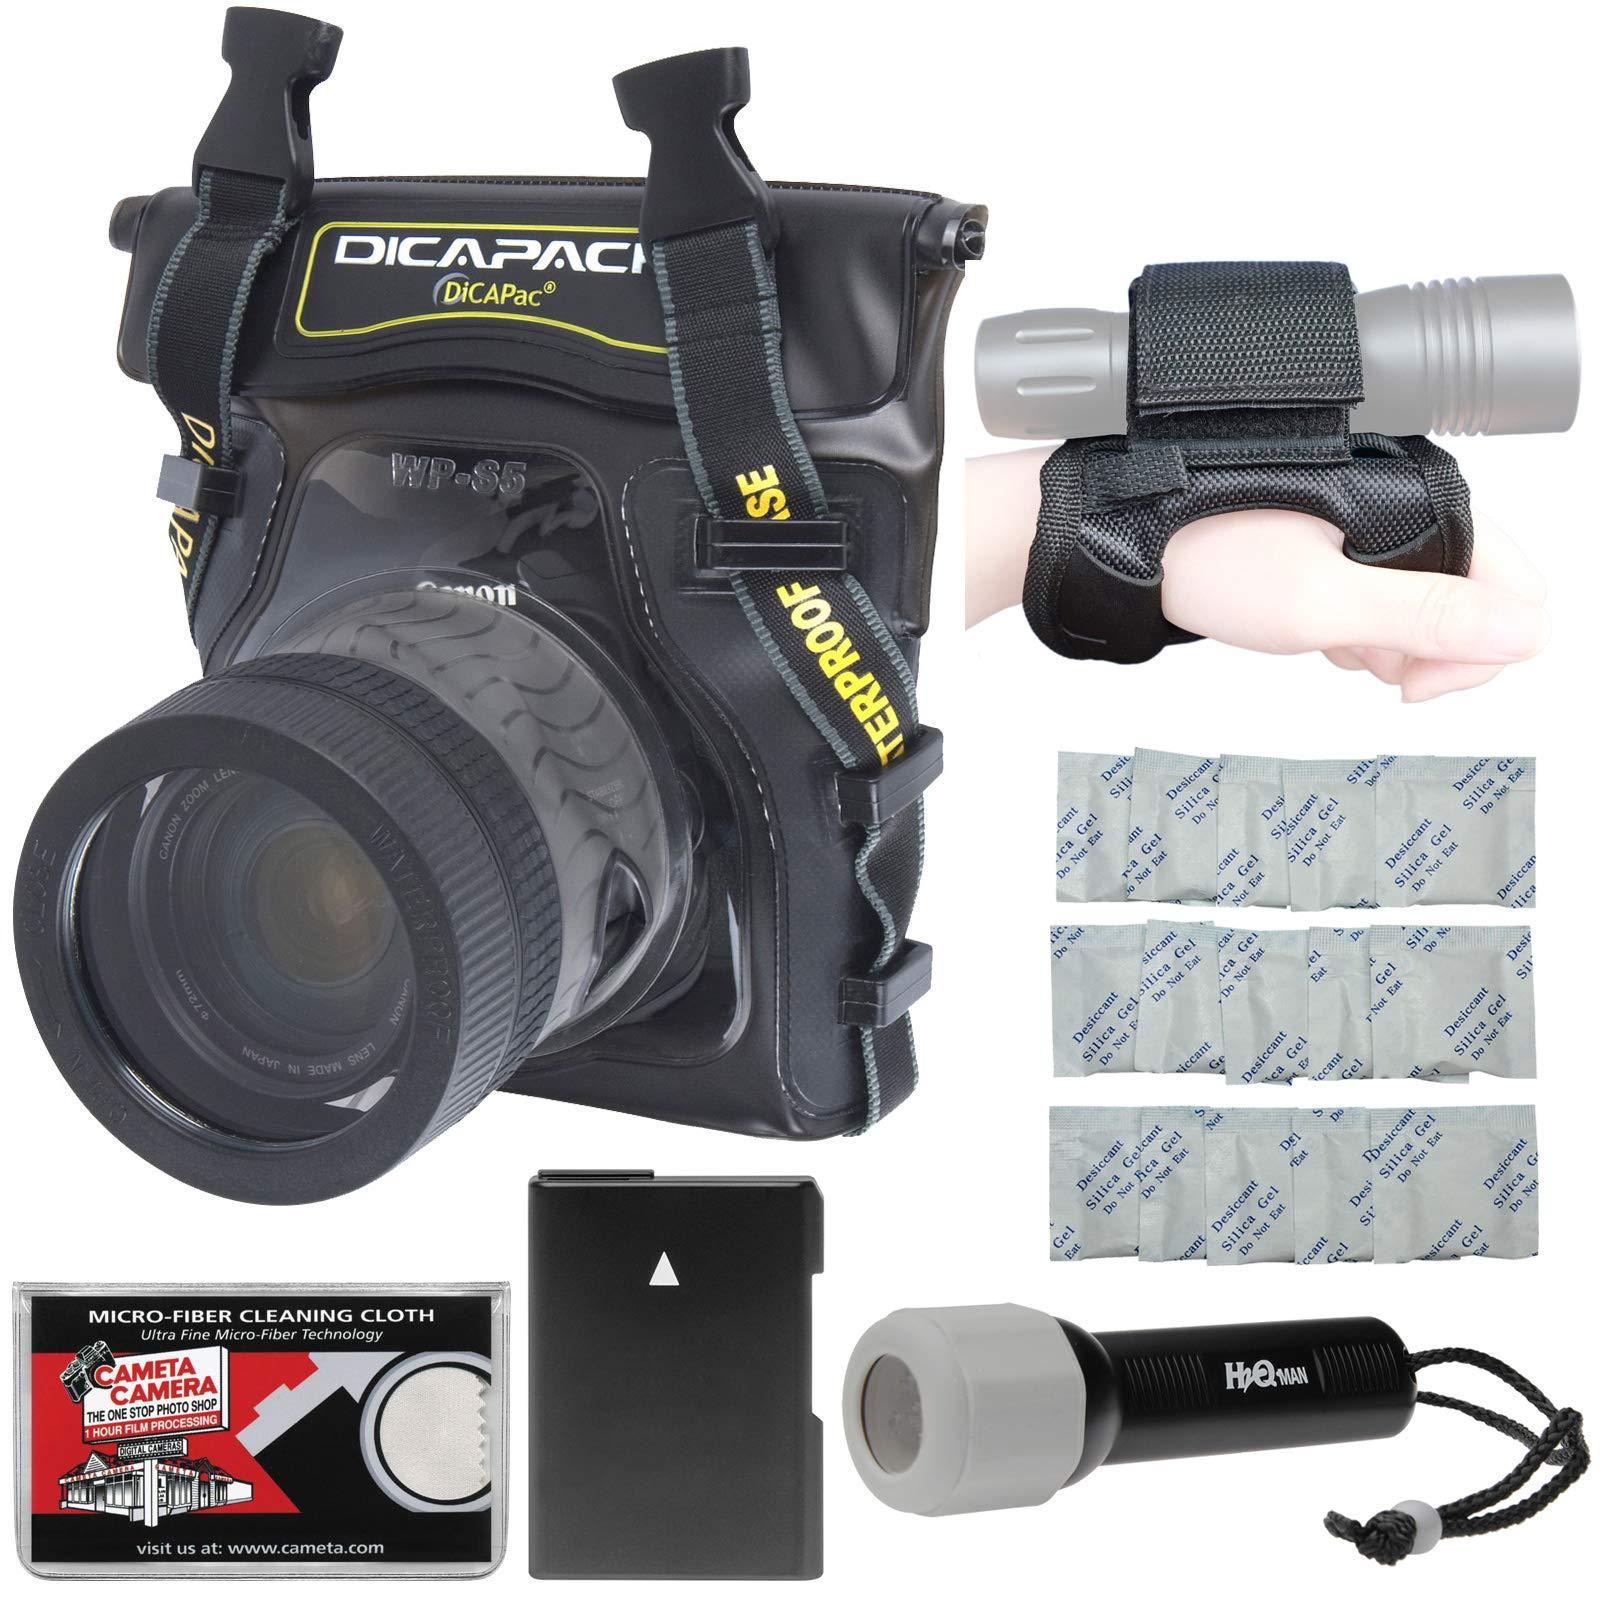 DiCAPac WP-S5 Waterproof Underwater Housing Case with EN-EL14 Battery + LED Torch & Handstrap Kit for Nikon D3300, D3400, D5300, D5500. D5600 Digital SLR Cameras